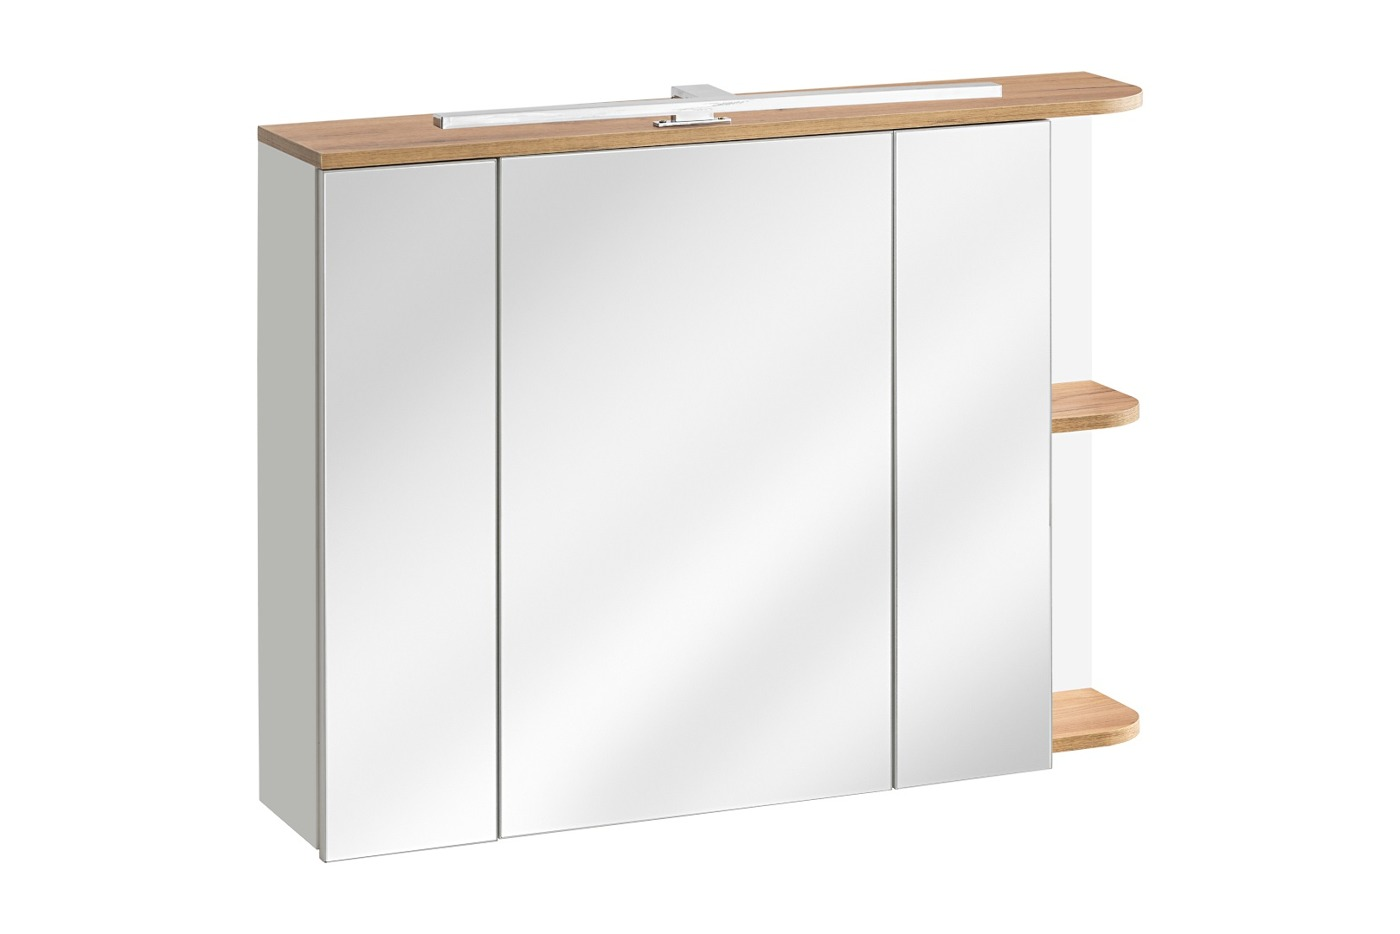 ArtCom Kúpeľňová zostava PLATINUM Platinum: zrkadlová skrinka 840 | 94 x 20 x 72 cm